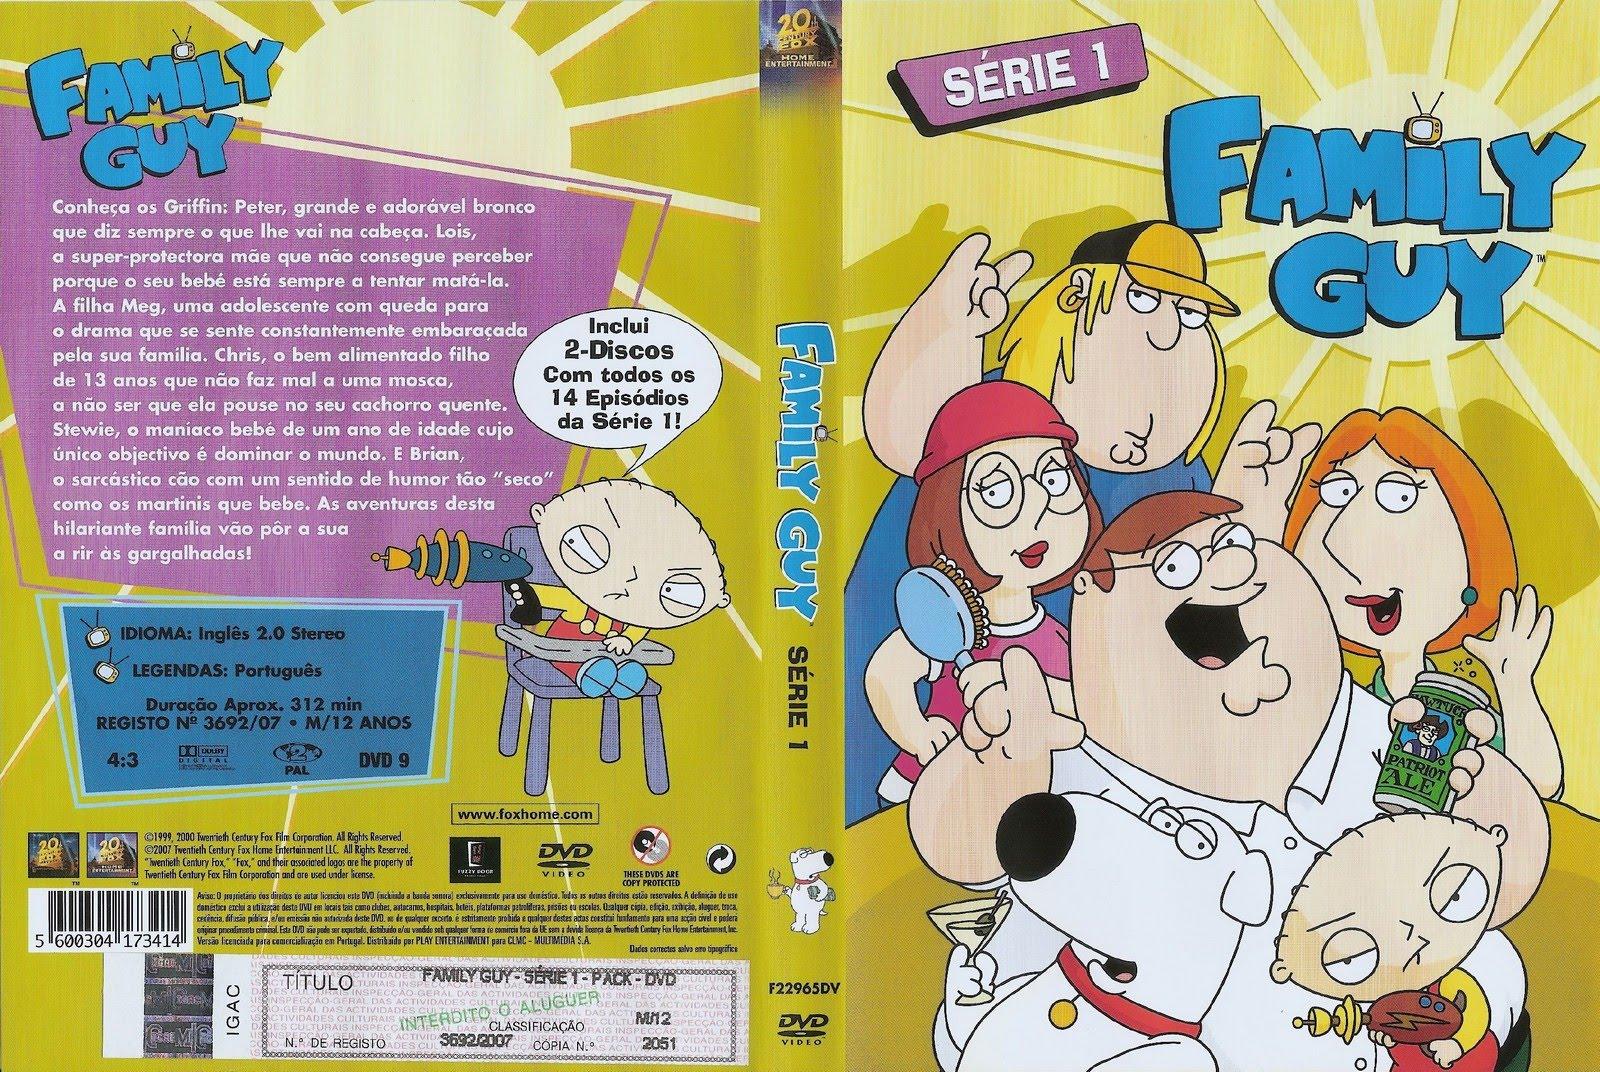 http://3.bp.blogspot.com/-ay9sbFavudQ/TcgS4hFaBHI/AAAAAAAABv4/5G_ygSoSxyw/s1600/Family-Guy-Serie-1-PT.jpg